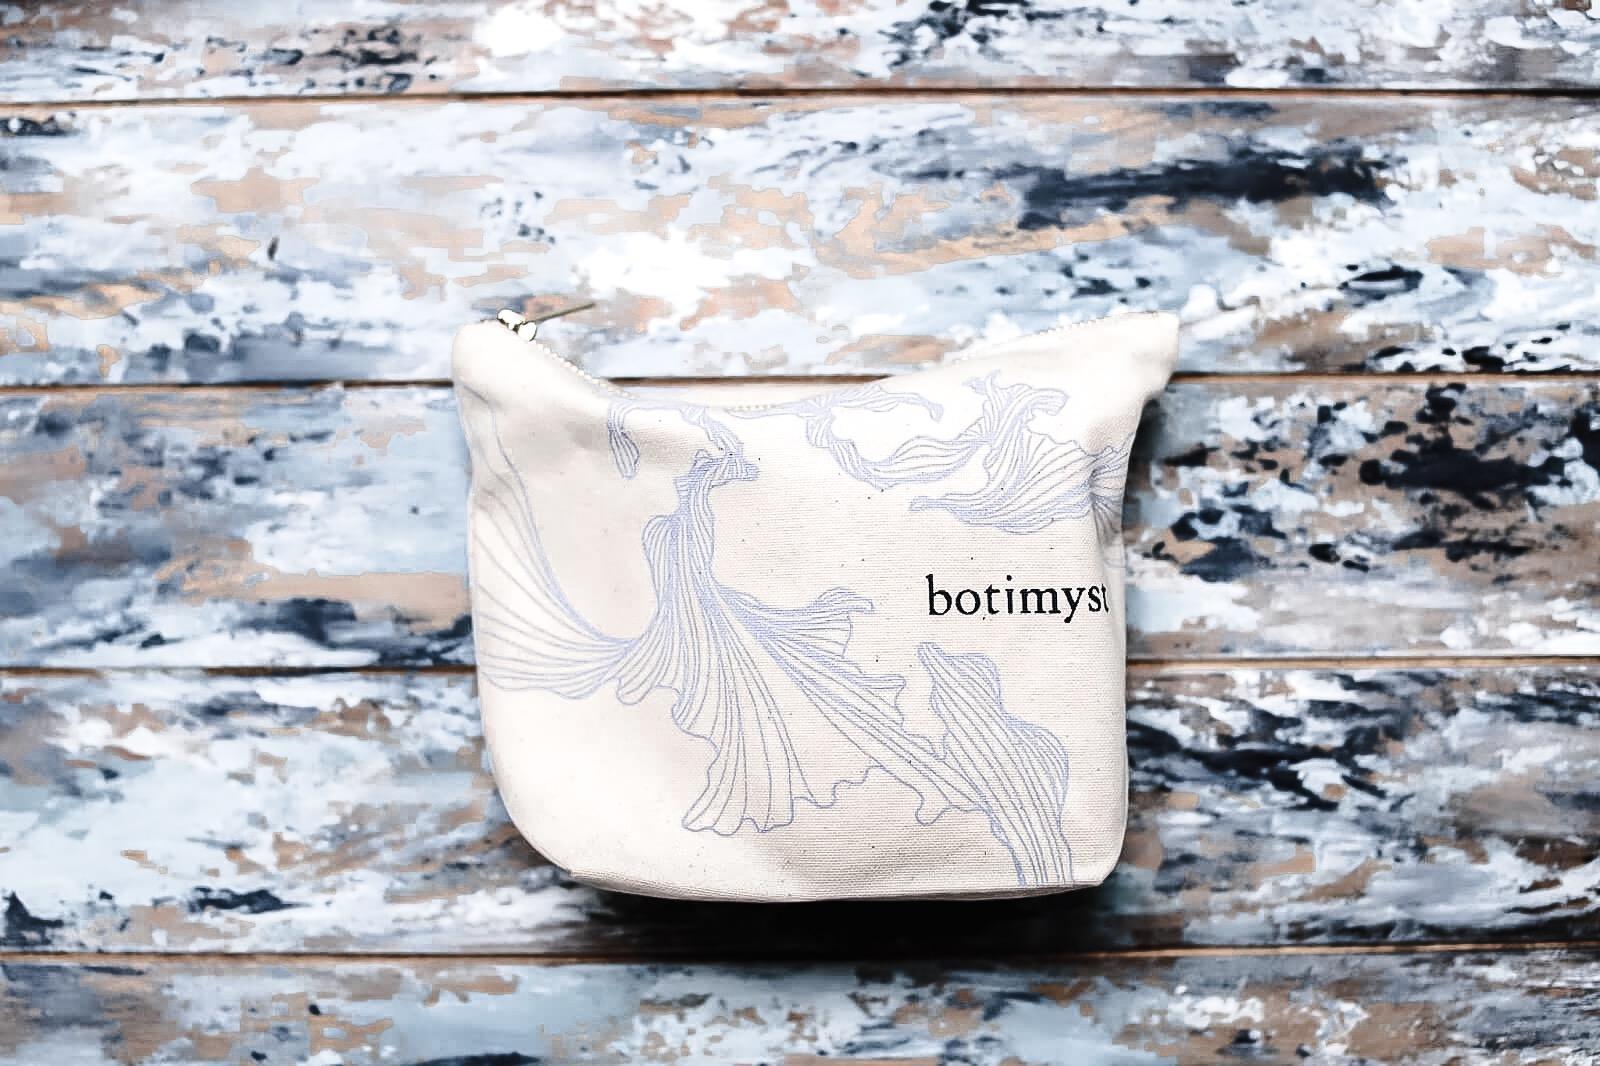 botimyst-eshop-beaute-clean-avis